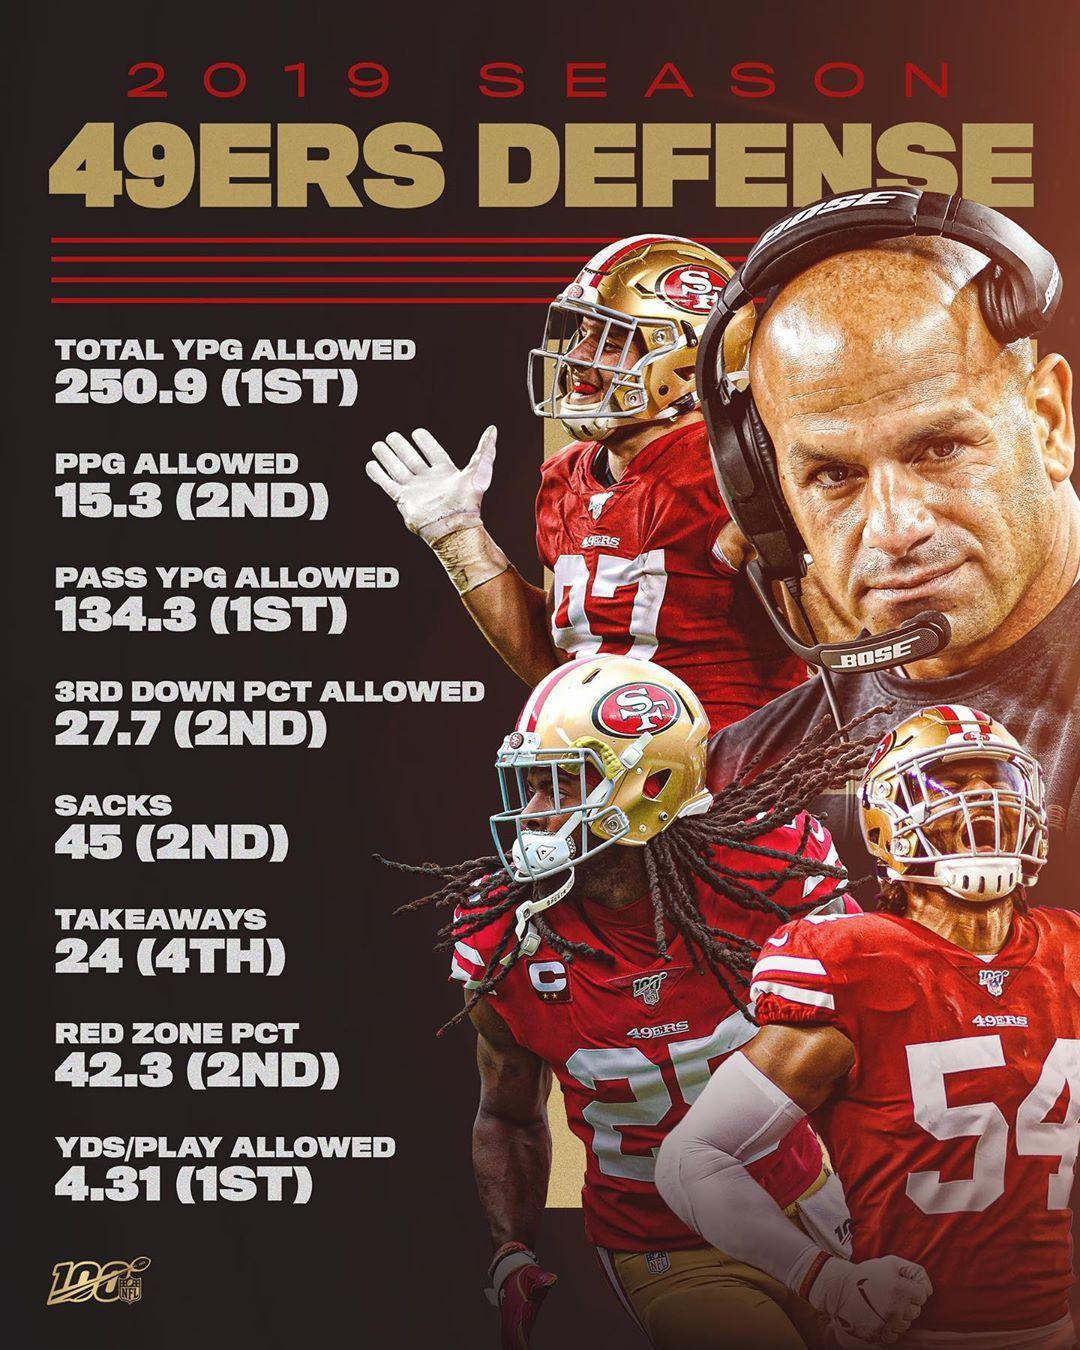 Nfl 49ers Defensive Coordinator Robert Saleh Is Leading One Of The Best Units In Th Big4 Bigfour Big4 Bigfo Nfl 49ers Nfl Football 49ers 49ers